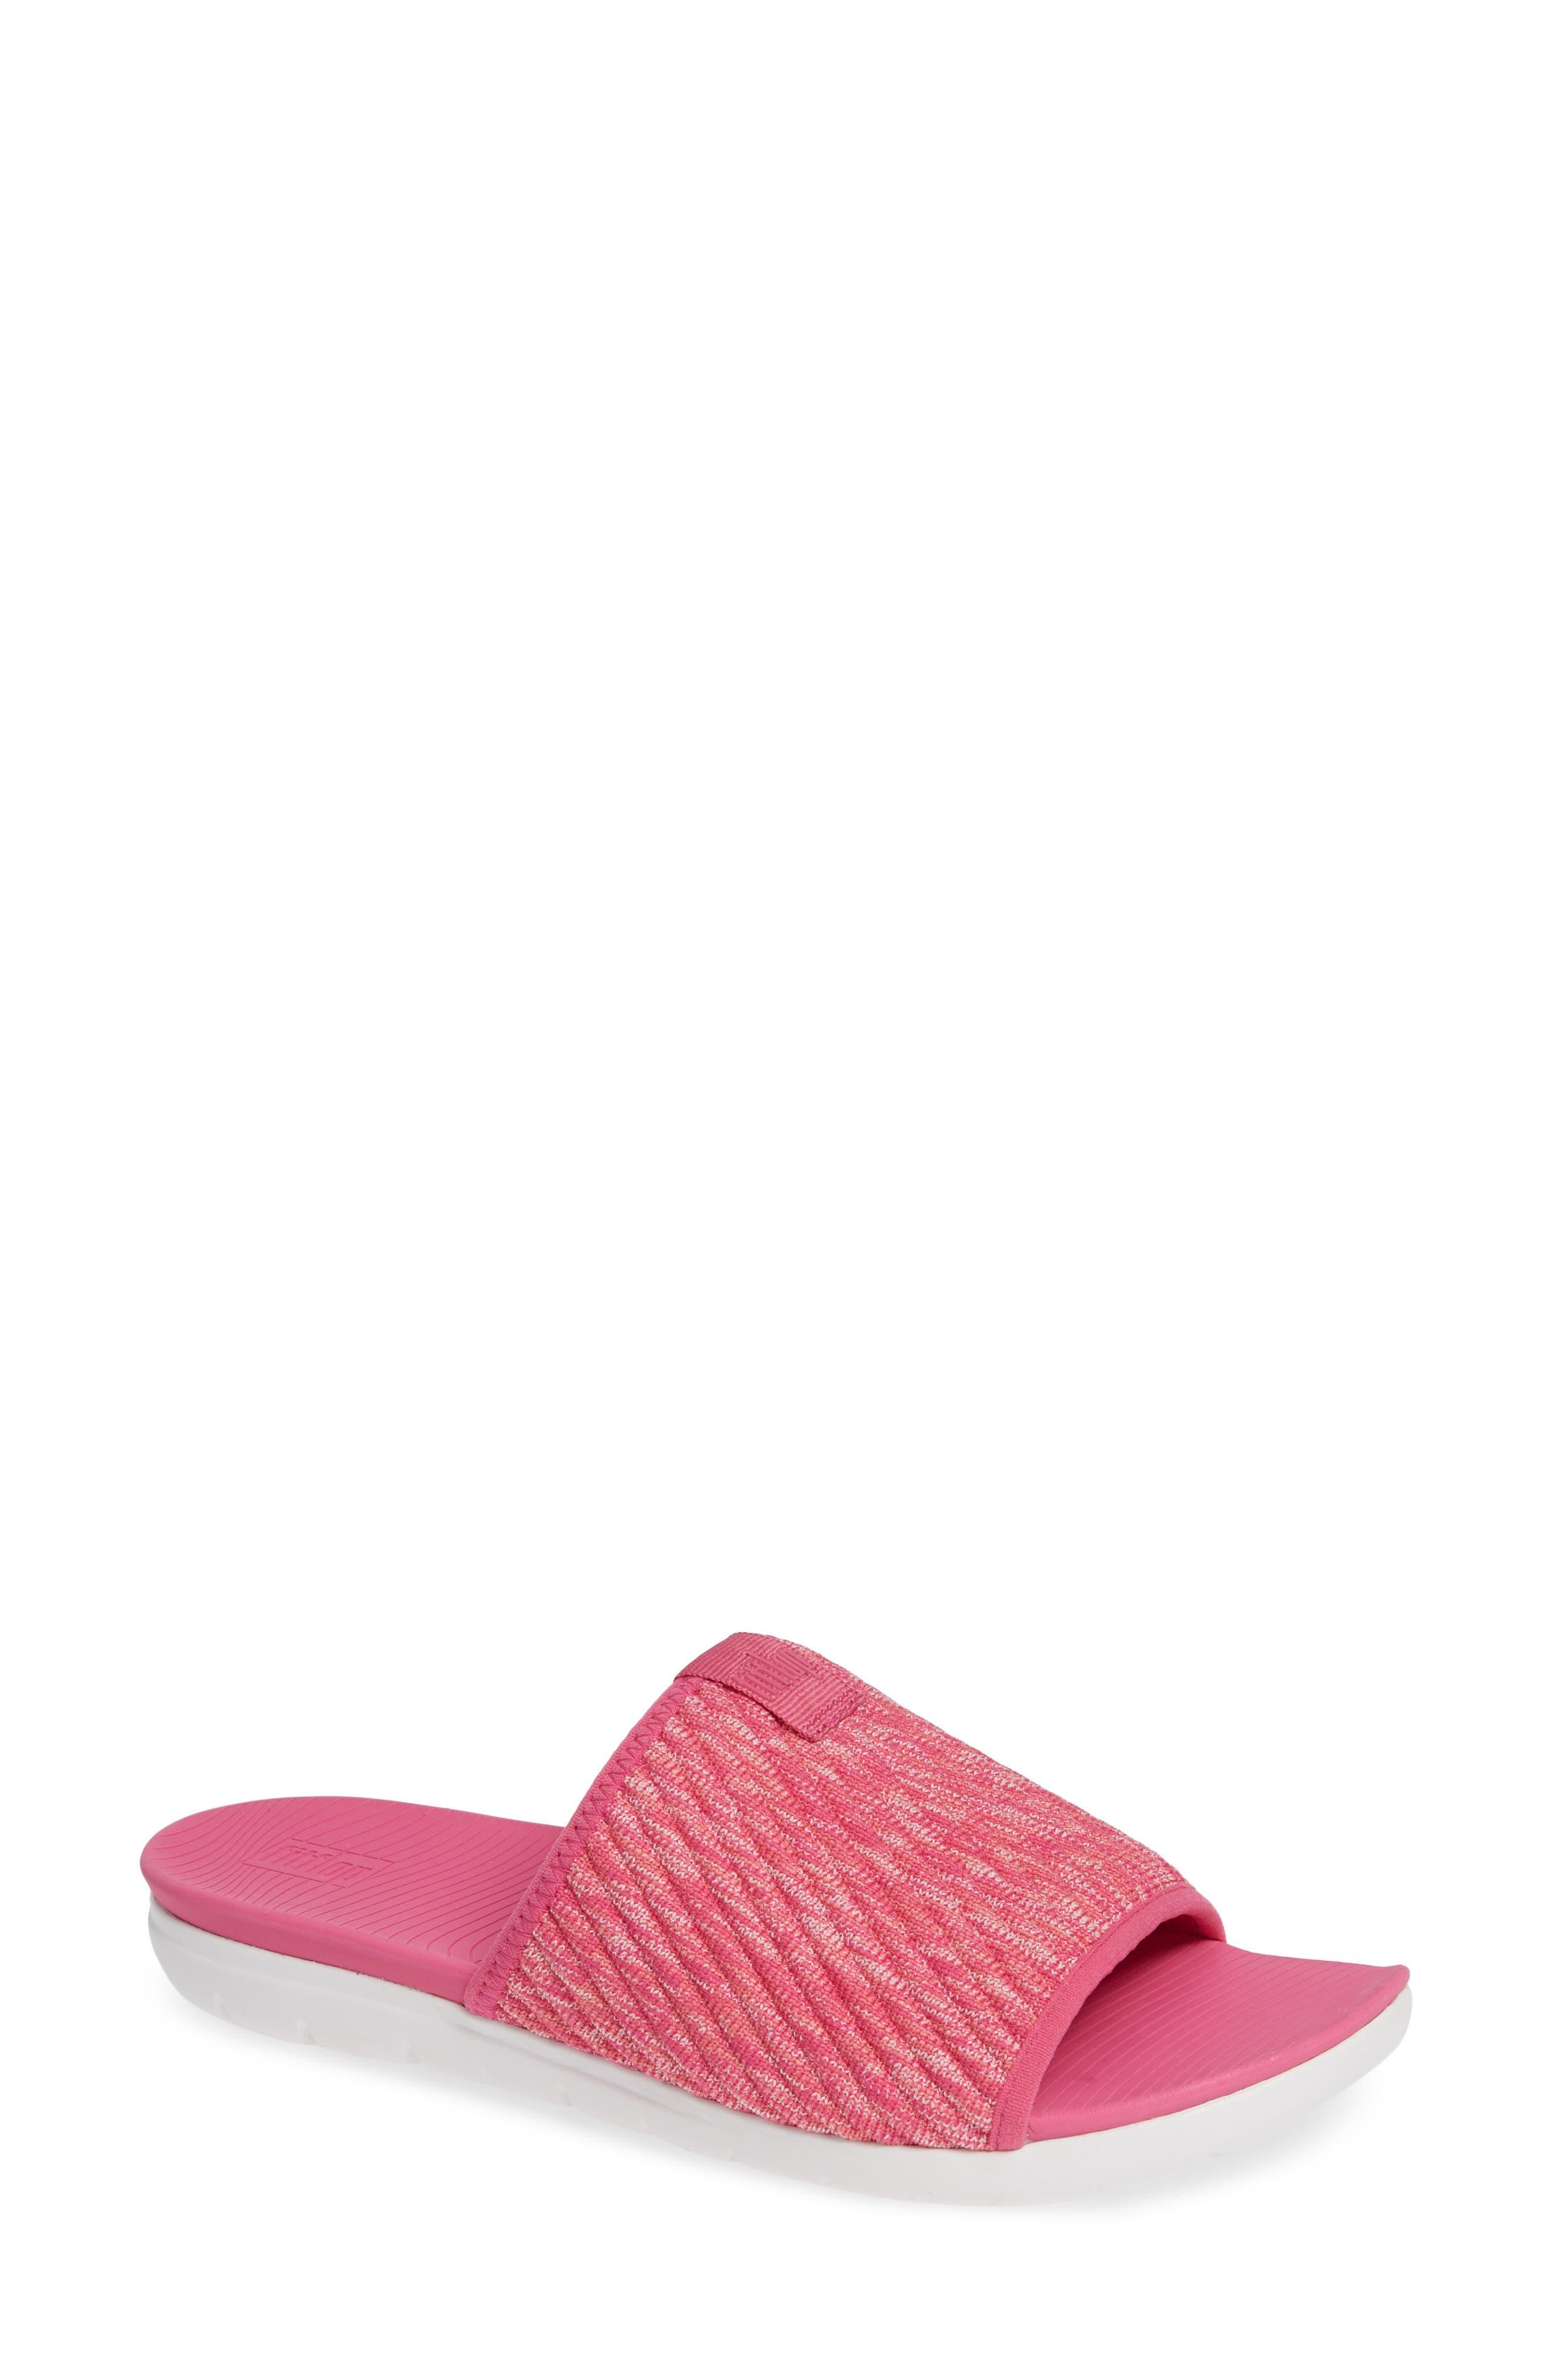 24bbe96230c Fitflop Artknit Slide Sandal